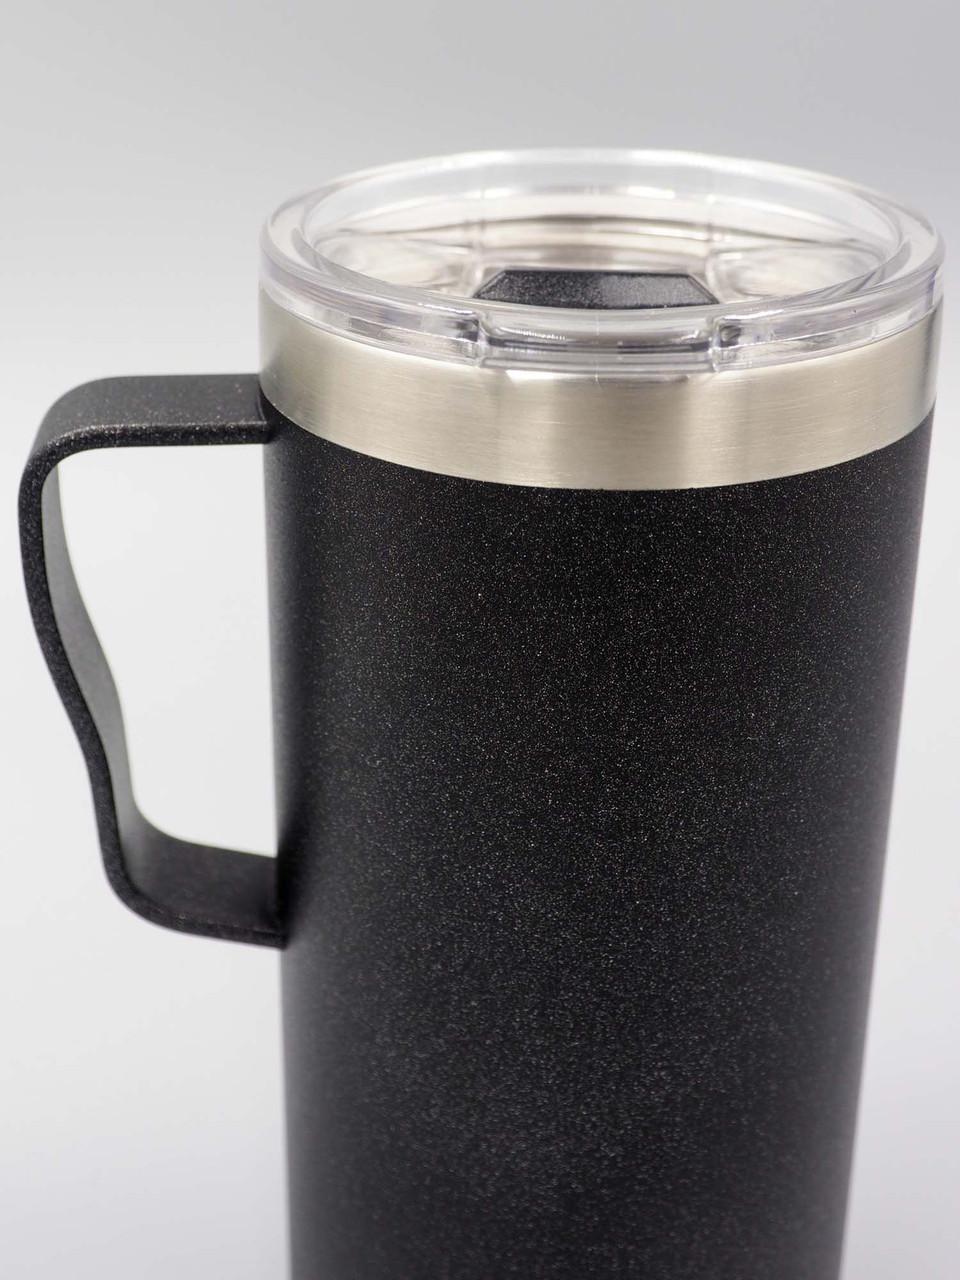 pure drinkware gunmetal 18oz coffee mug